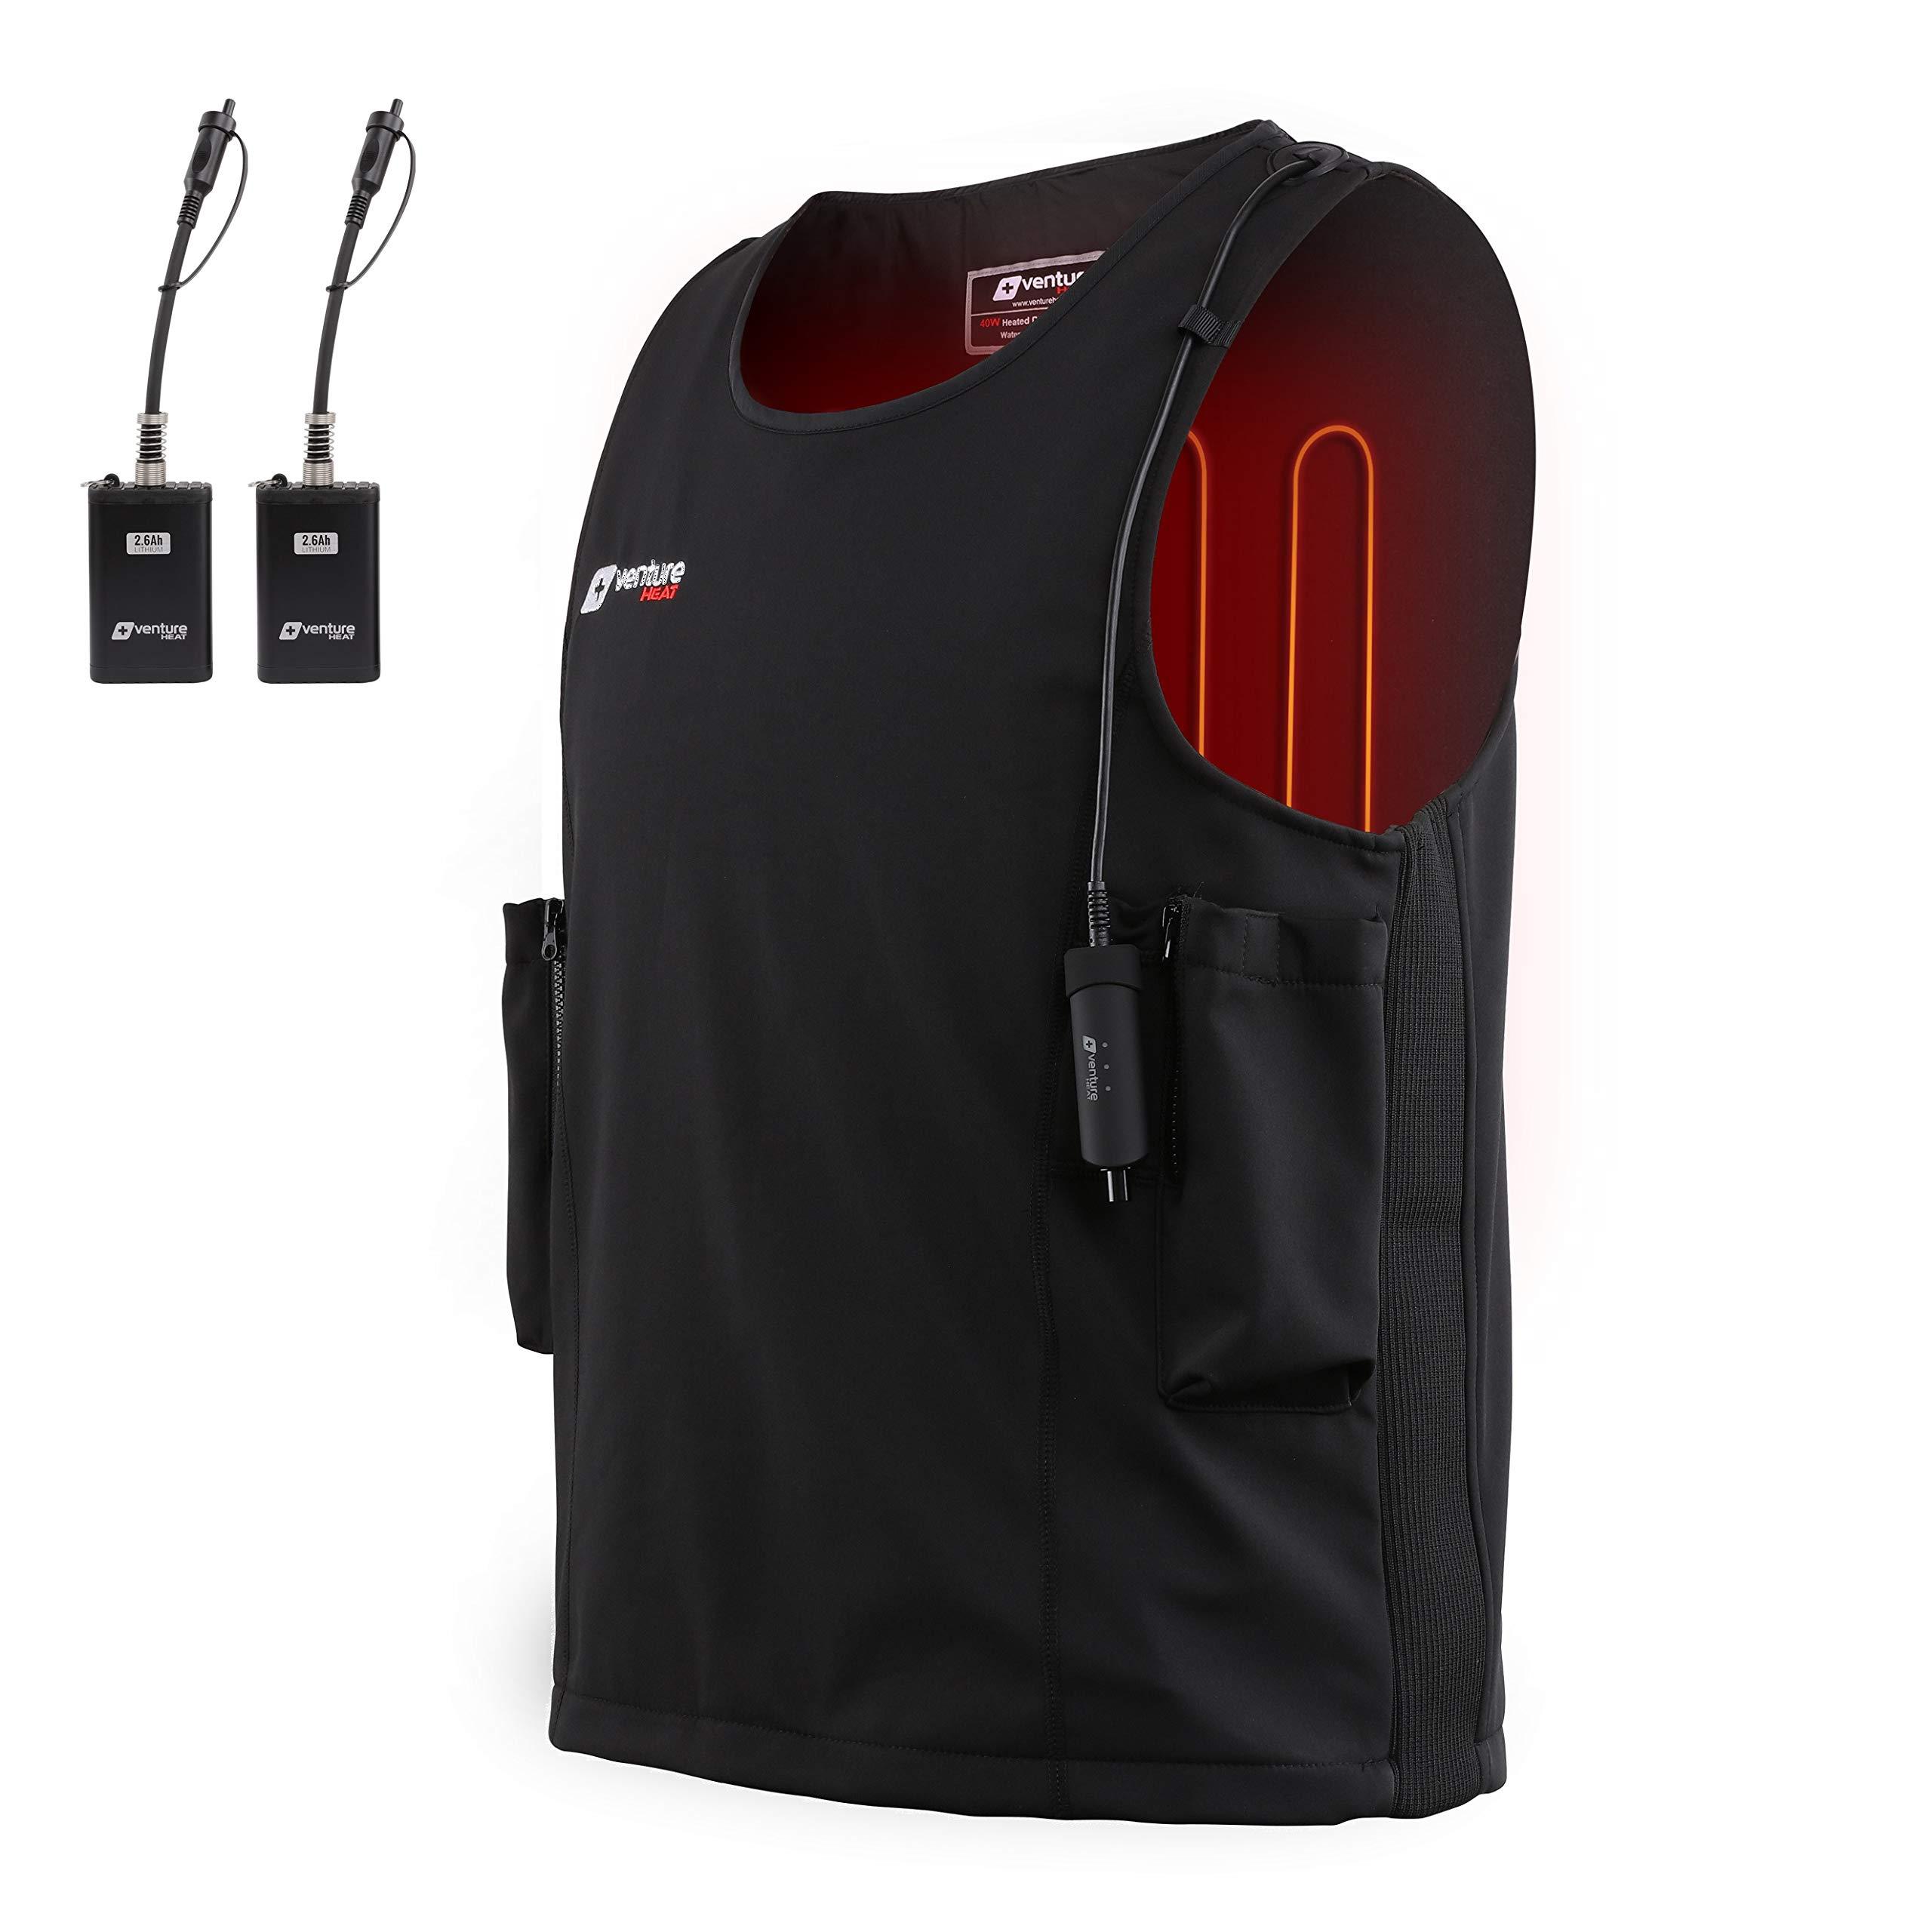 Venture Heat Waterproof Battery Heated Vest, 20W Diving Wet Suit - Surfing, Snorkling Gear, Kayaking, Sailing